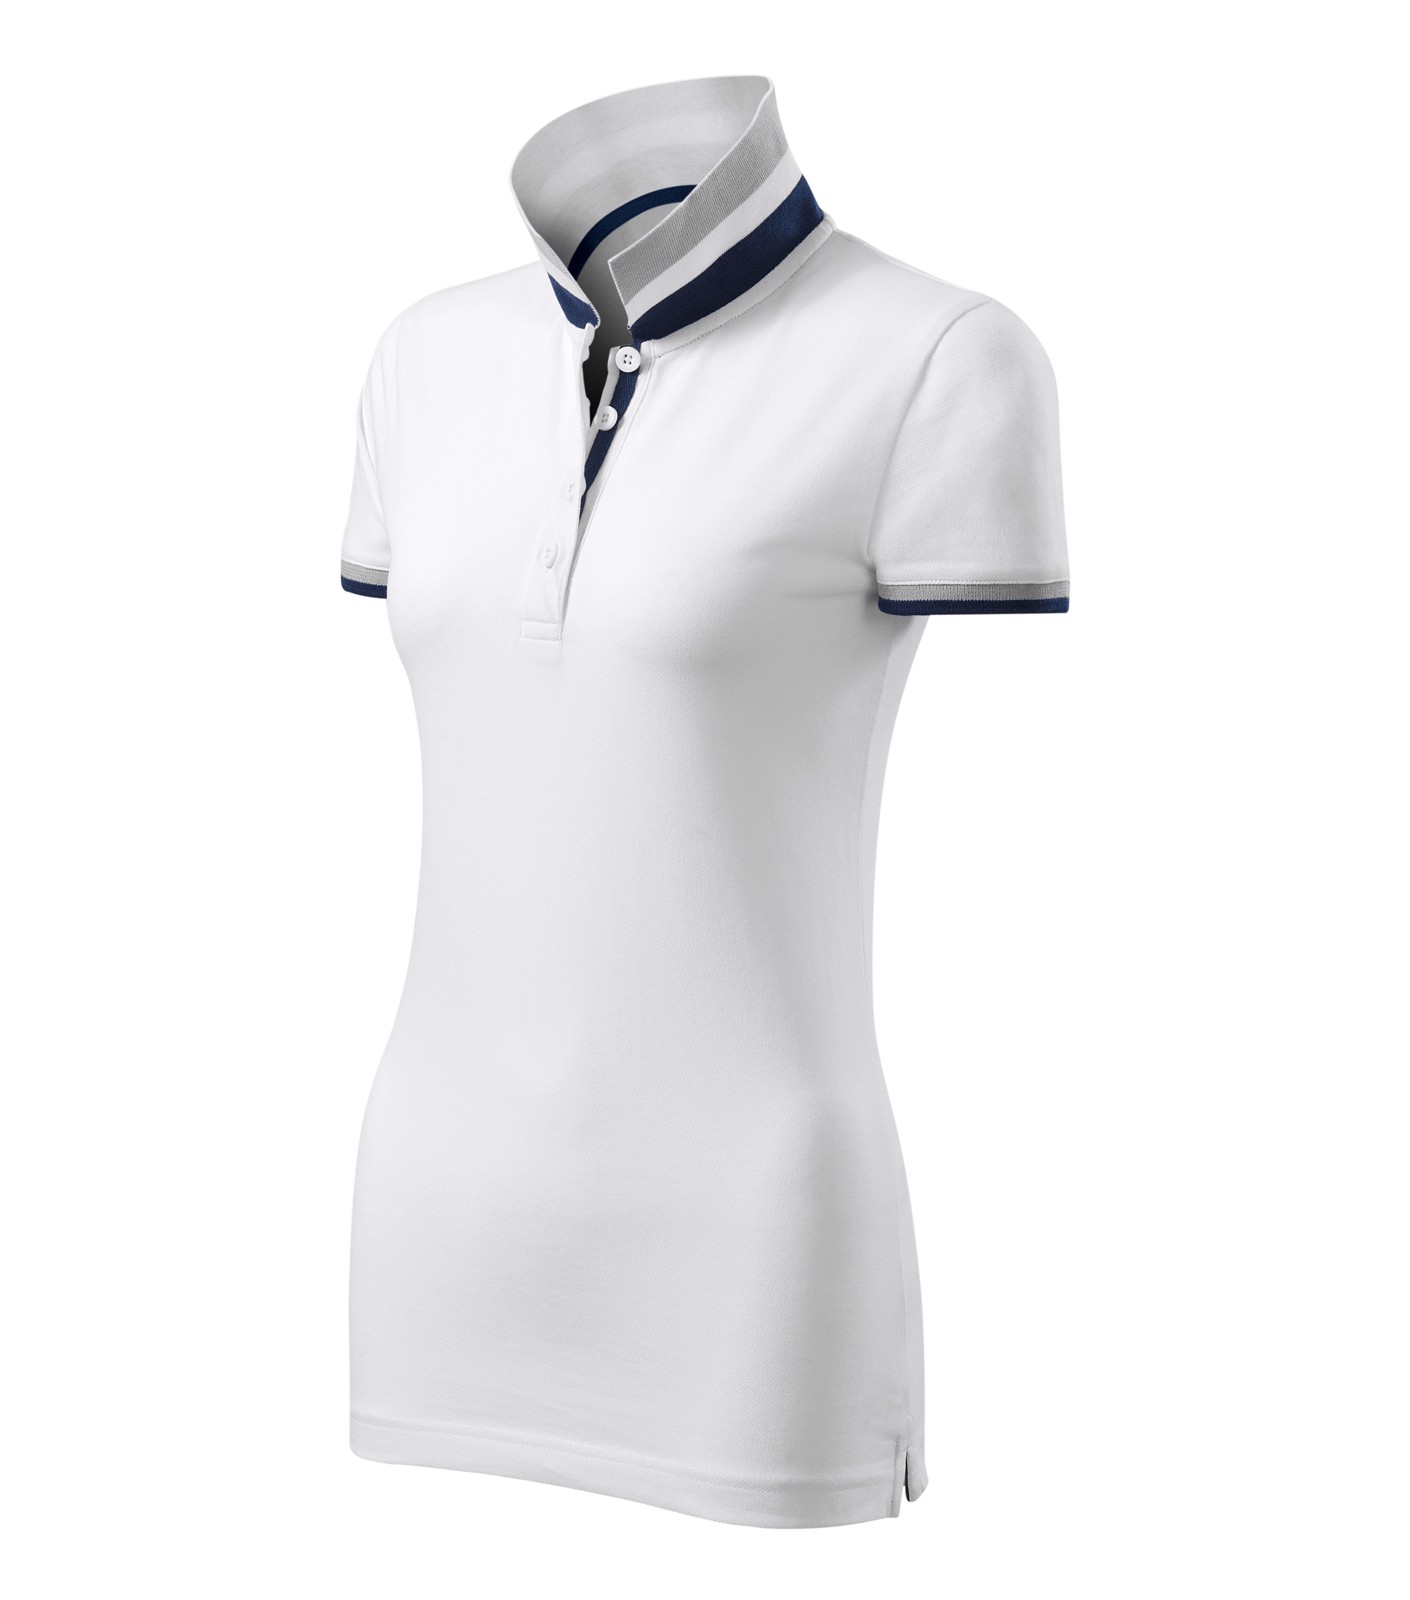 Polokošile dámská Malfinipremium Collar Up - Bílá / M